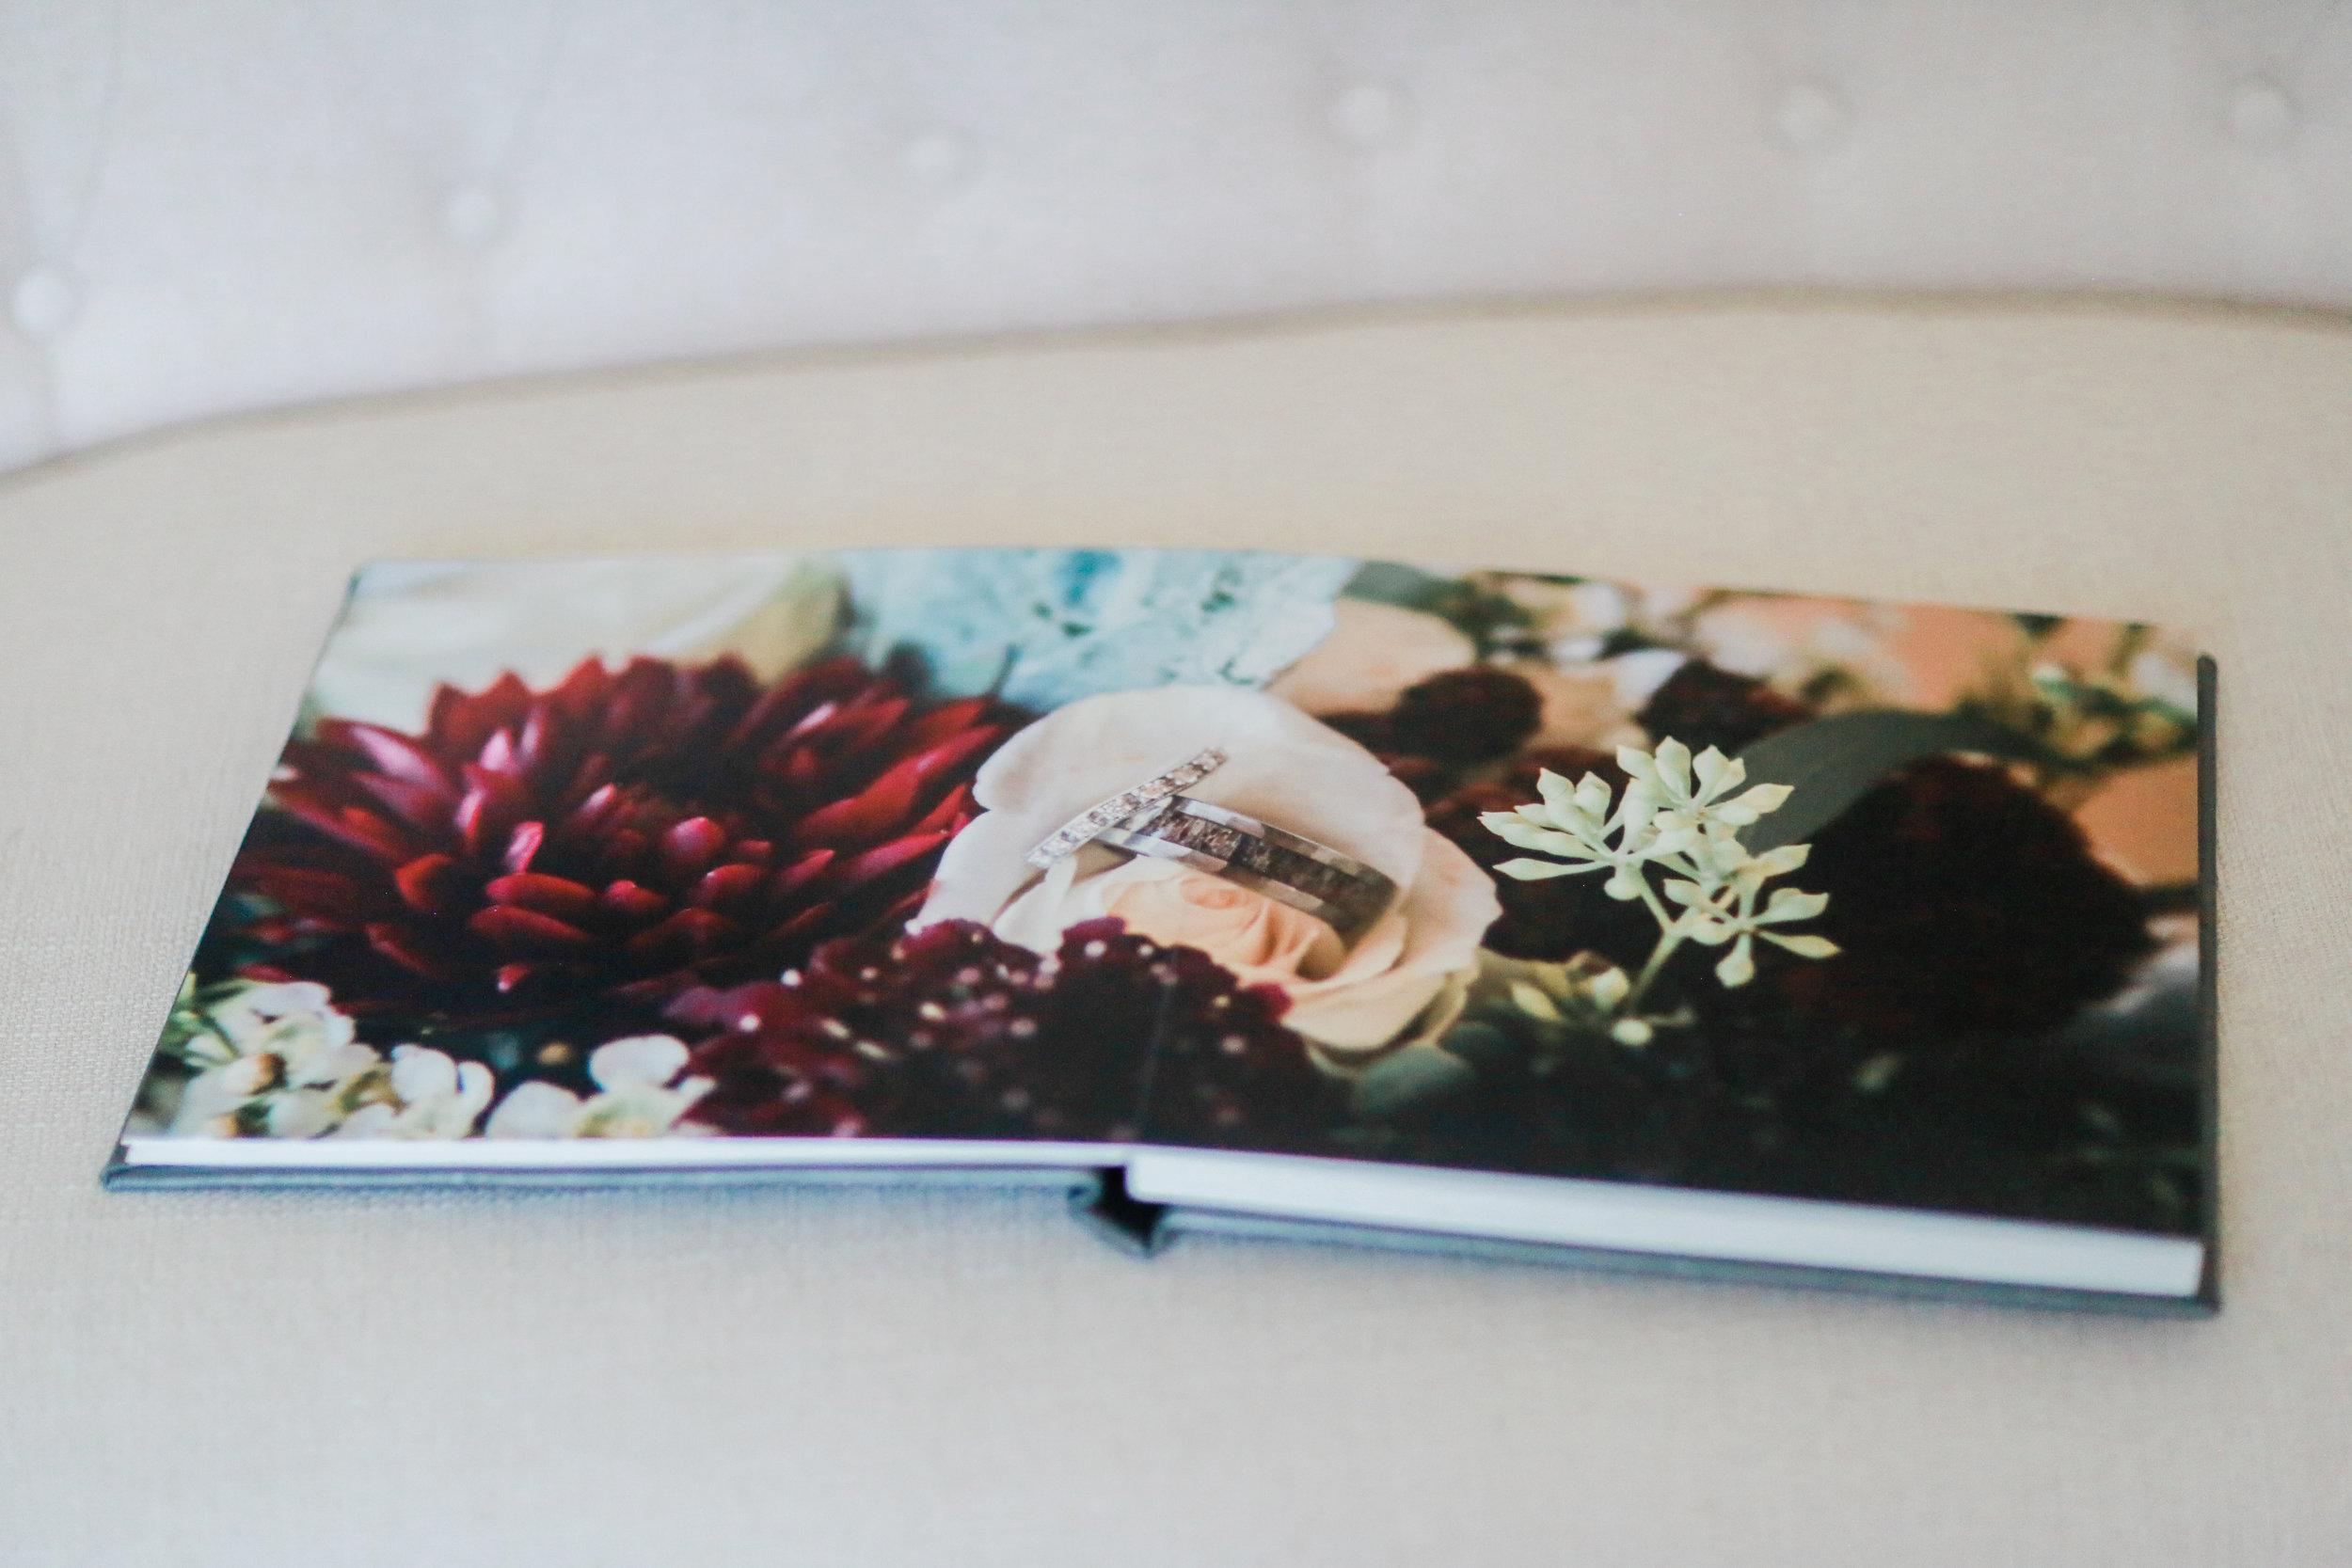 Studio Album & Stationery Images-30.jpg